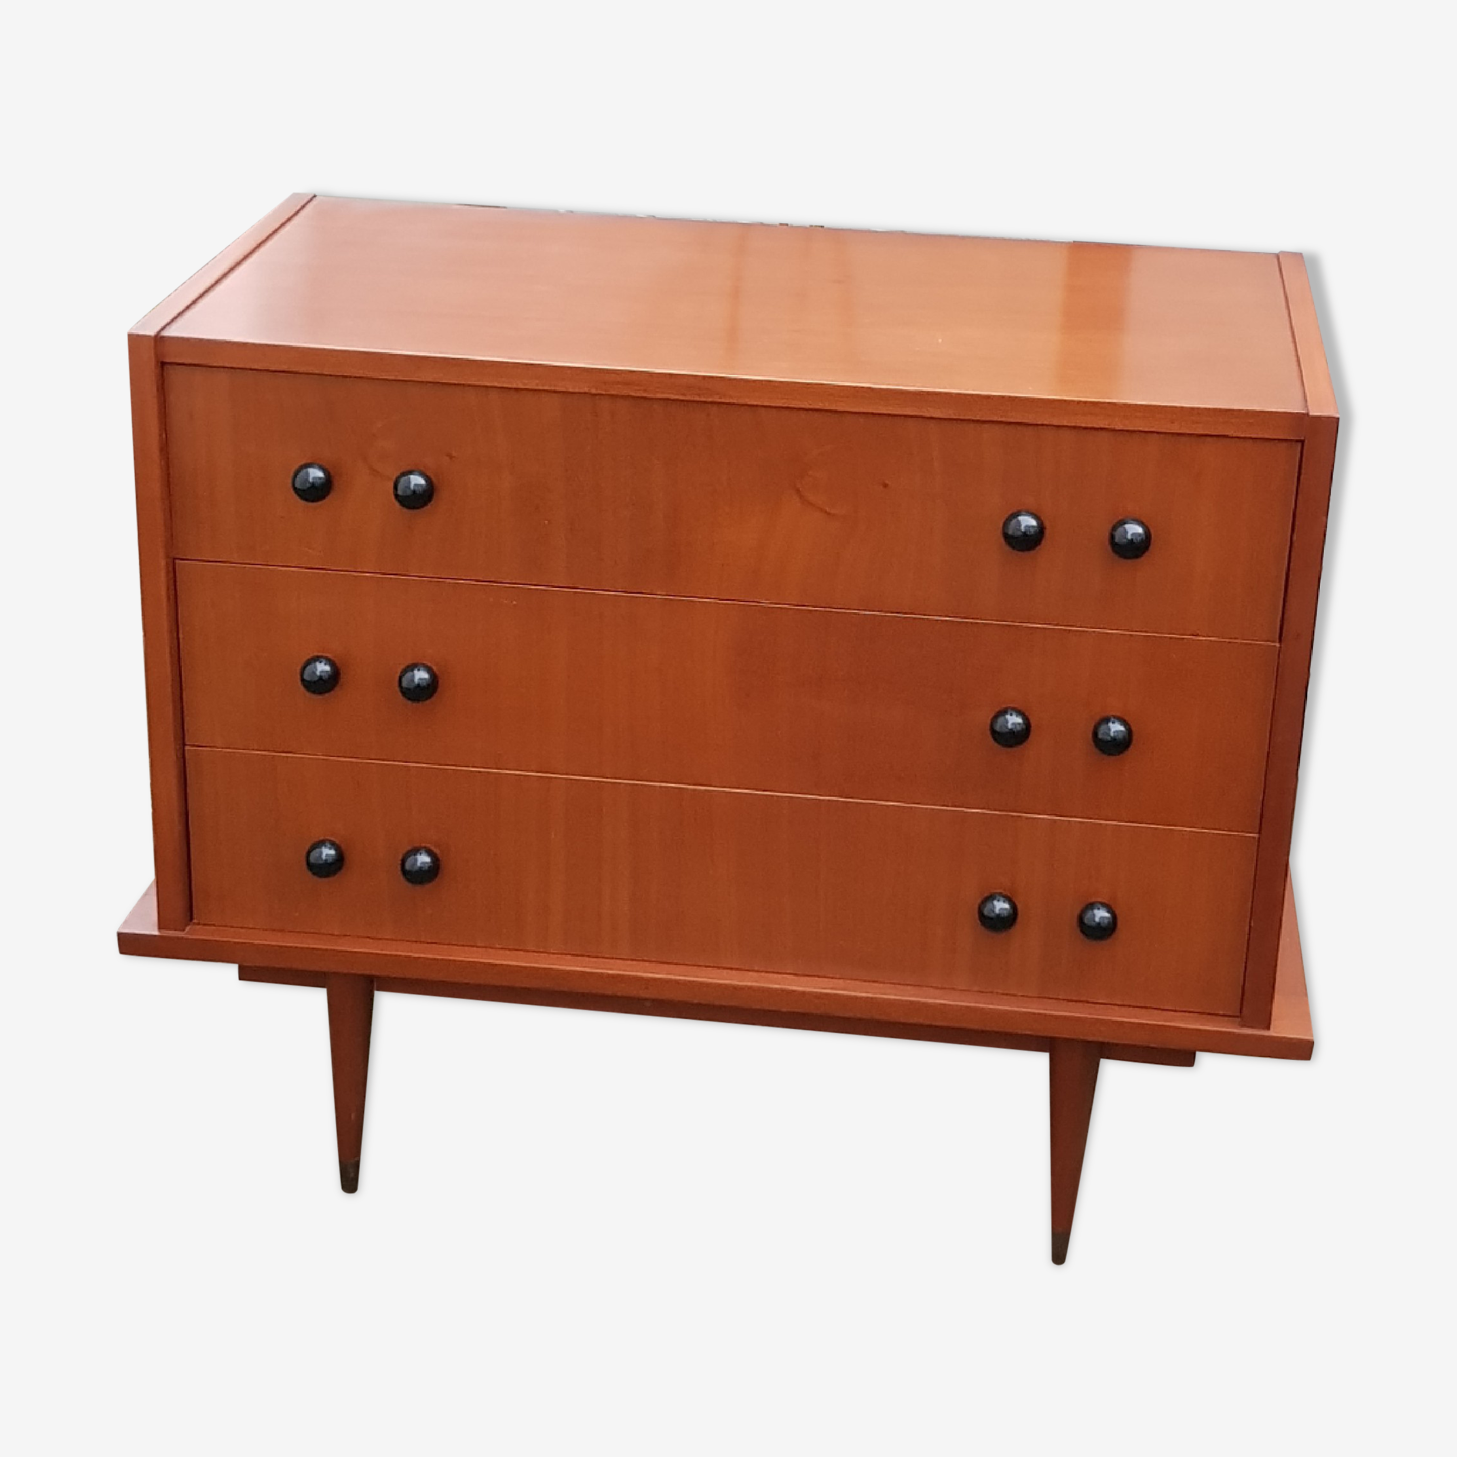 Chest of drawers teak 60s